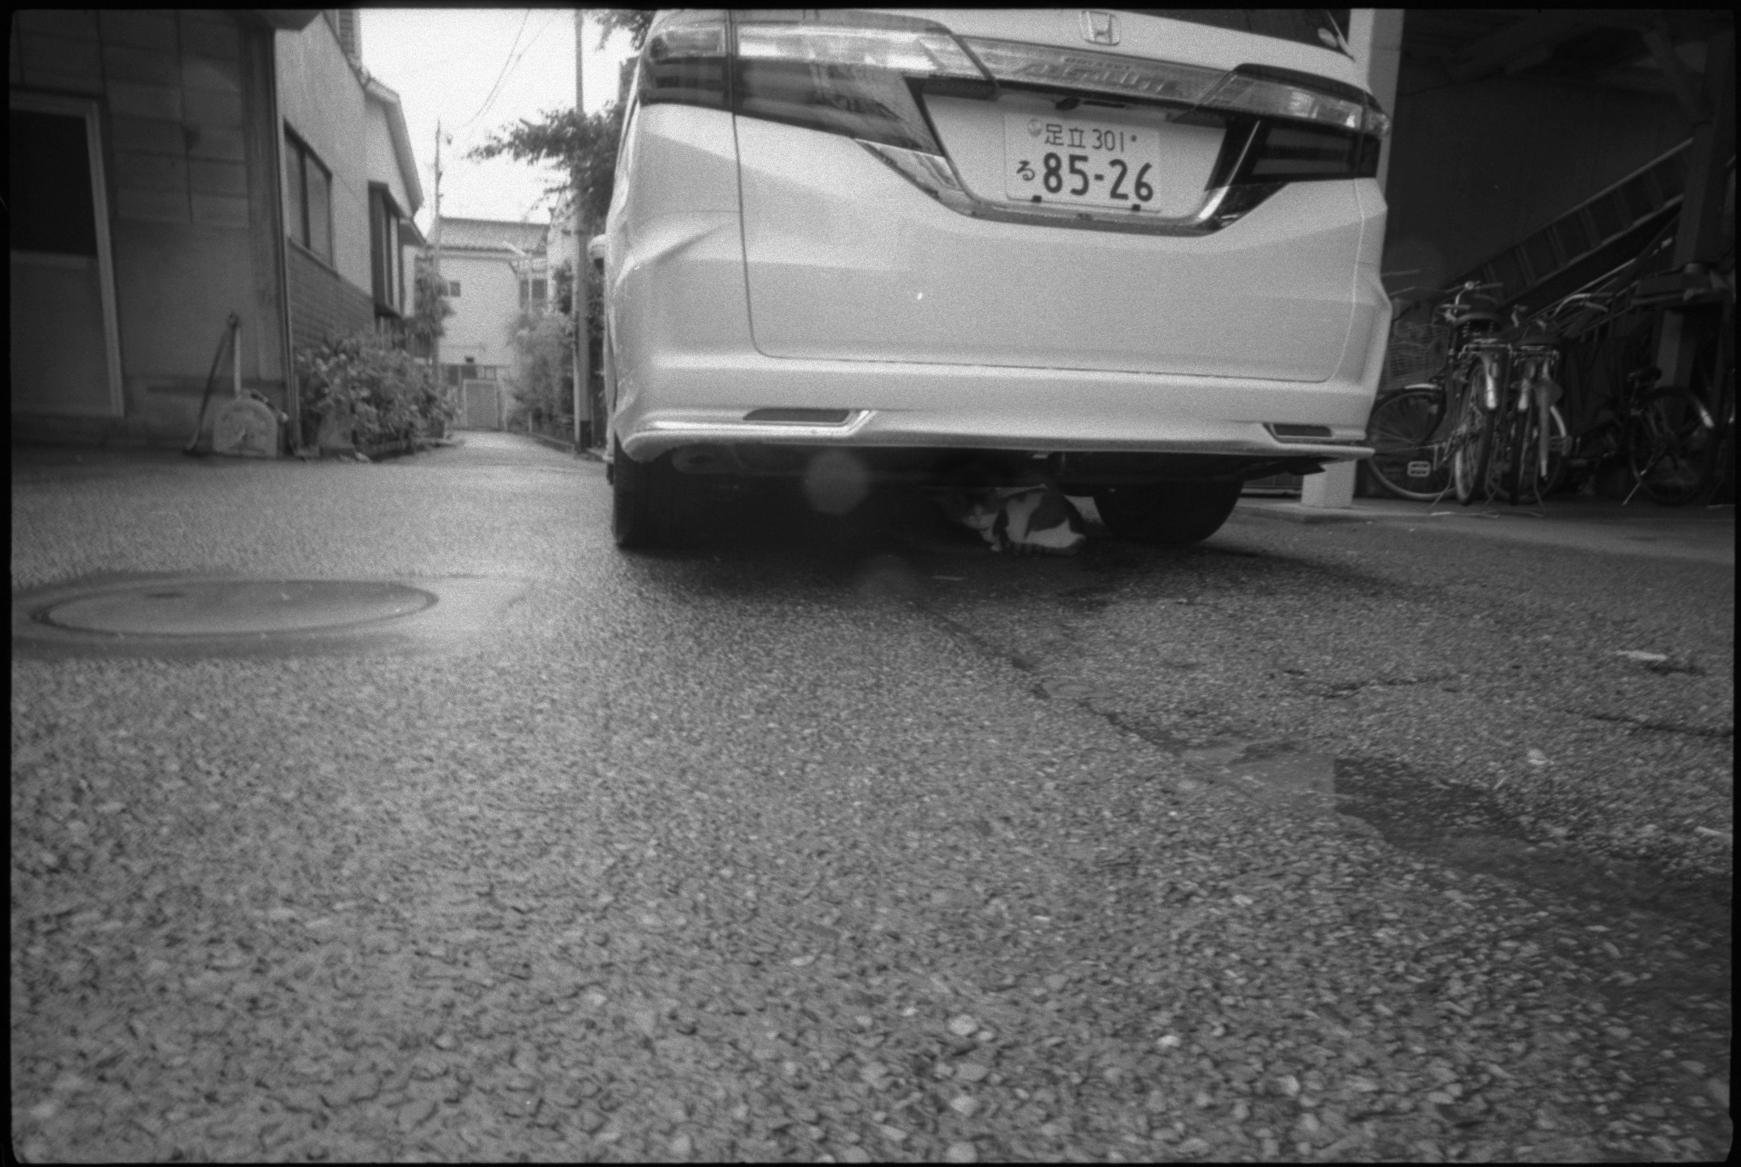 20140612 LeicaM4-P Biogon21G 400TX TMD 006